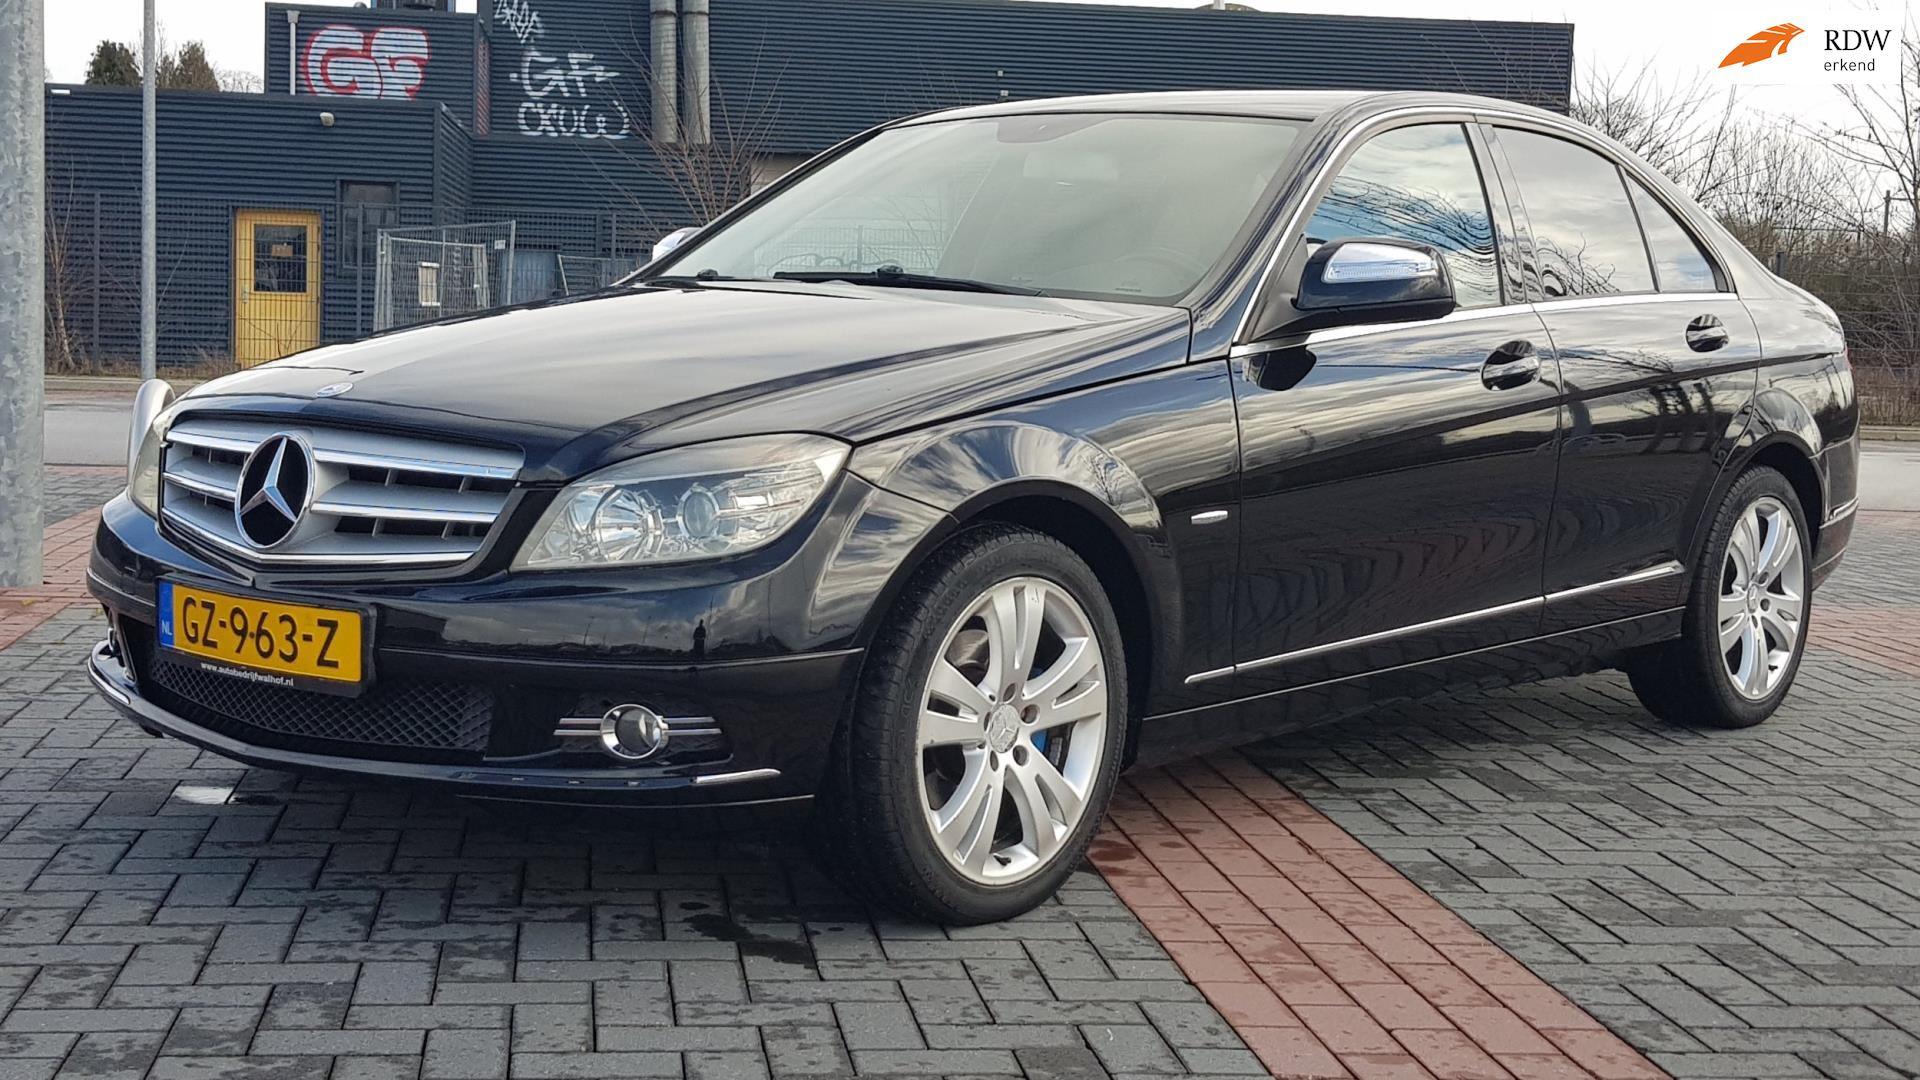 Mercedes-Benz C-klasse occasion - Autobedrijf R. Walhof